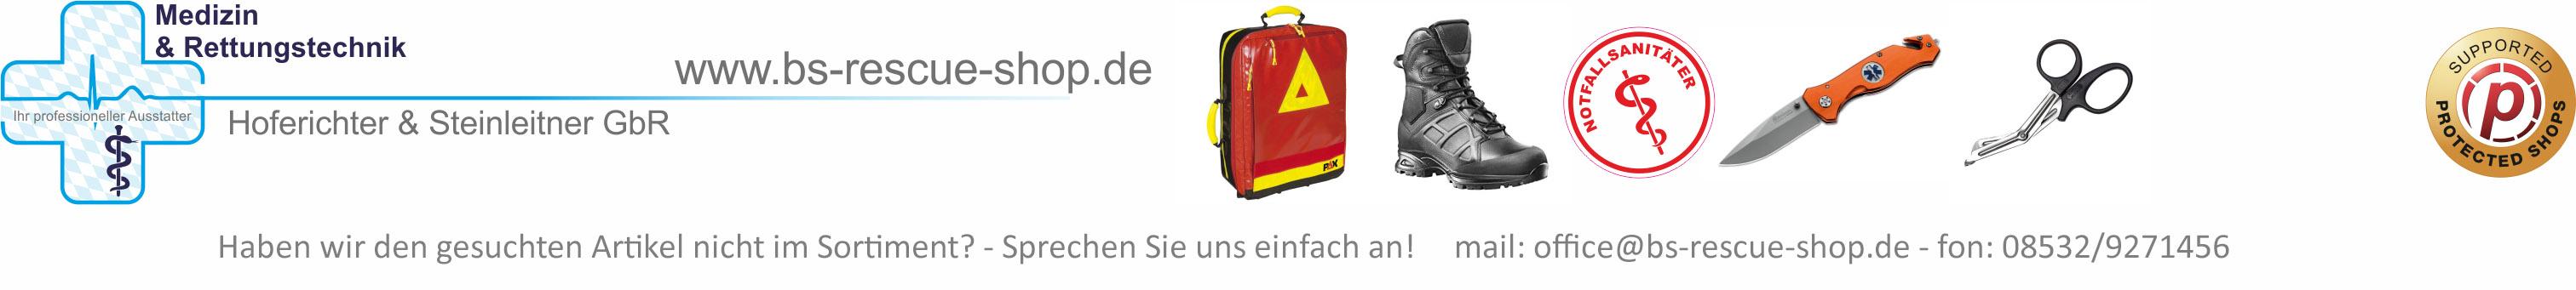 www.bs-rescue-shop.de-Logo